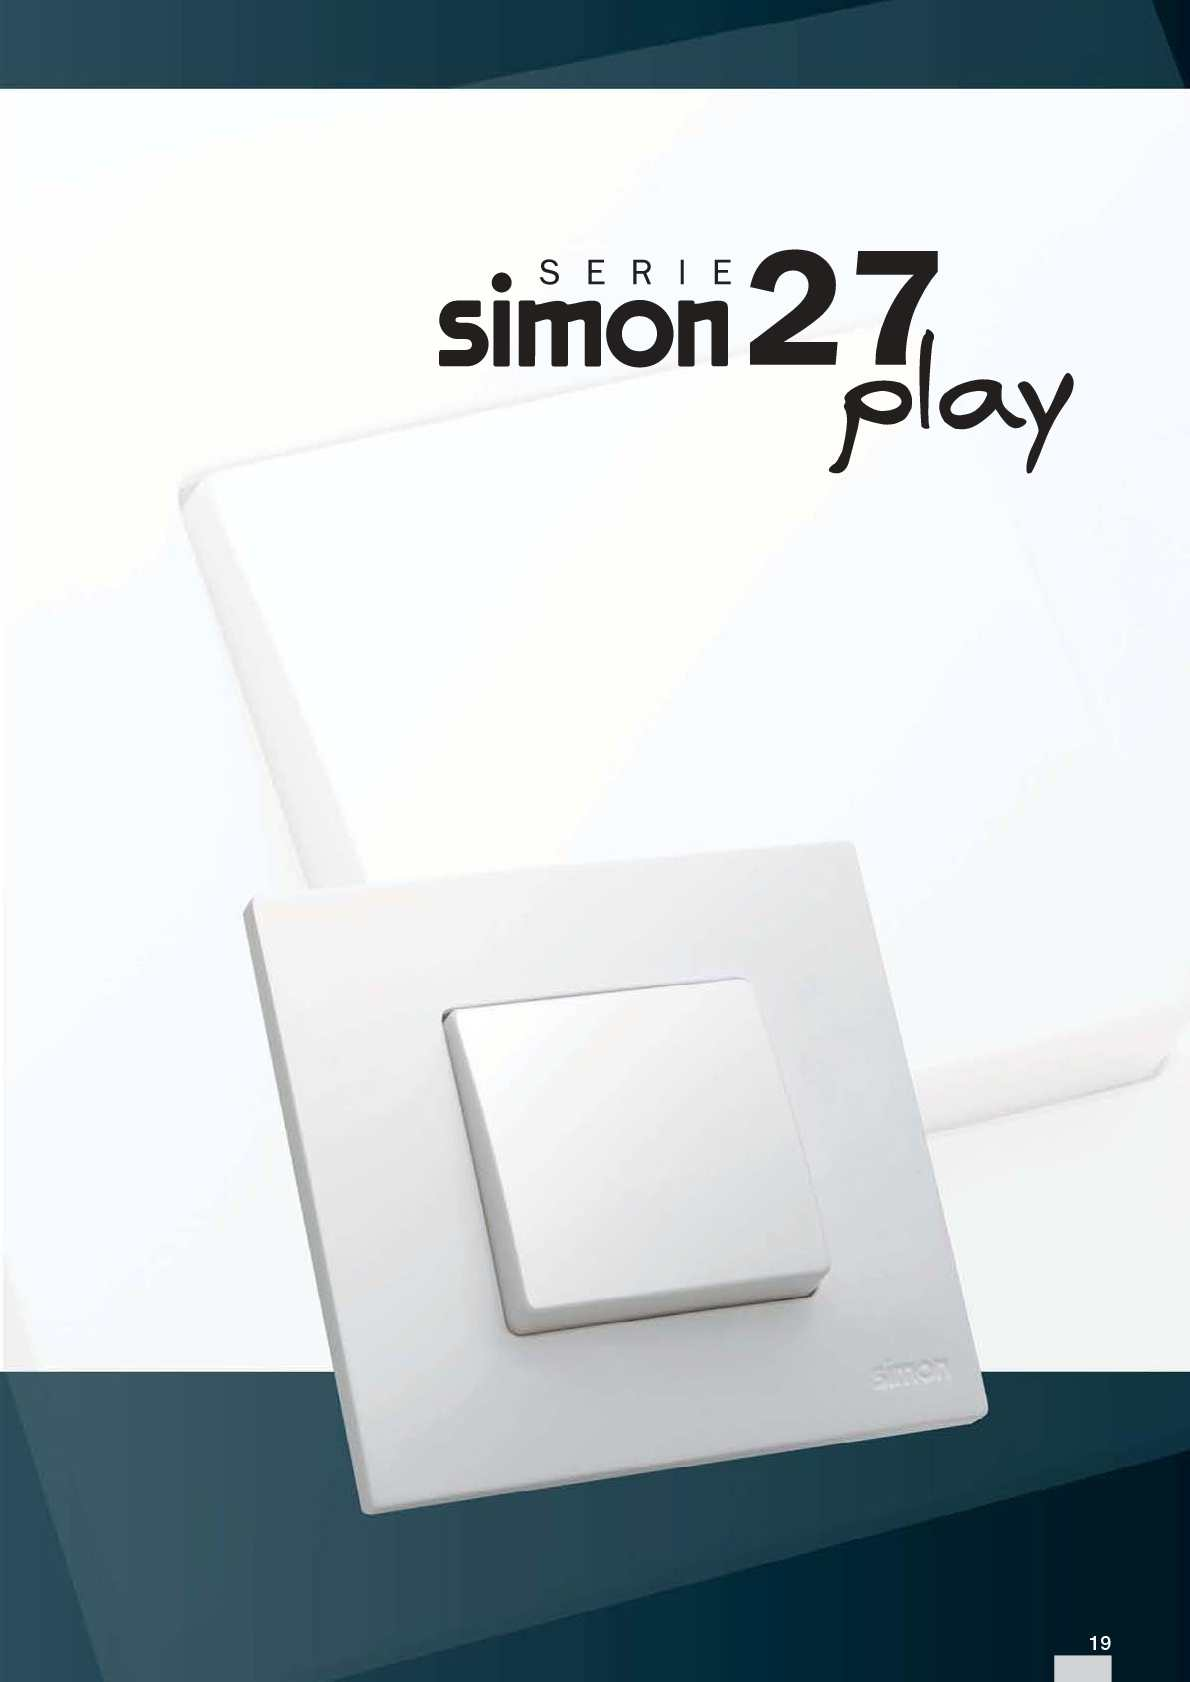 Calam o sim n 27 play - Simon 27 blanco ...